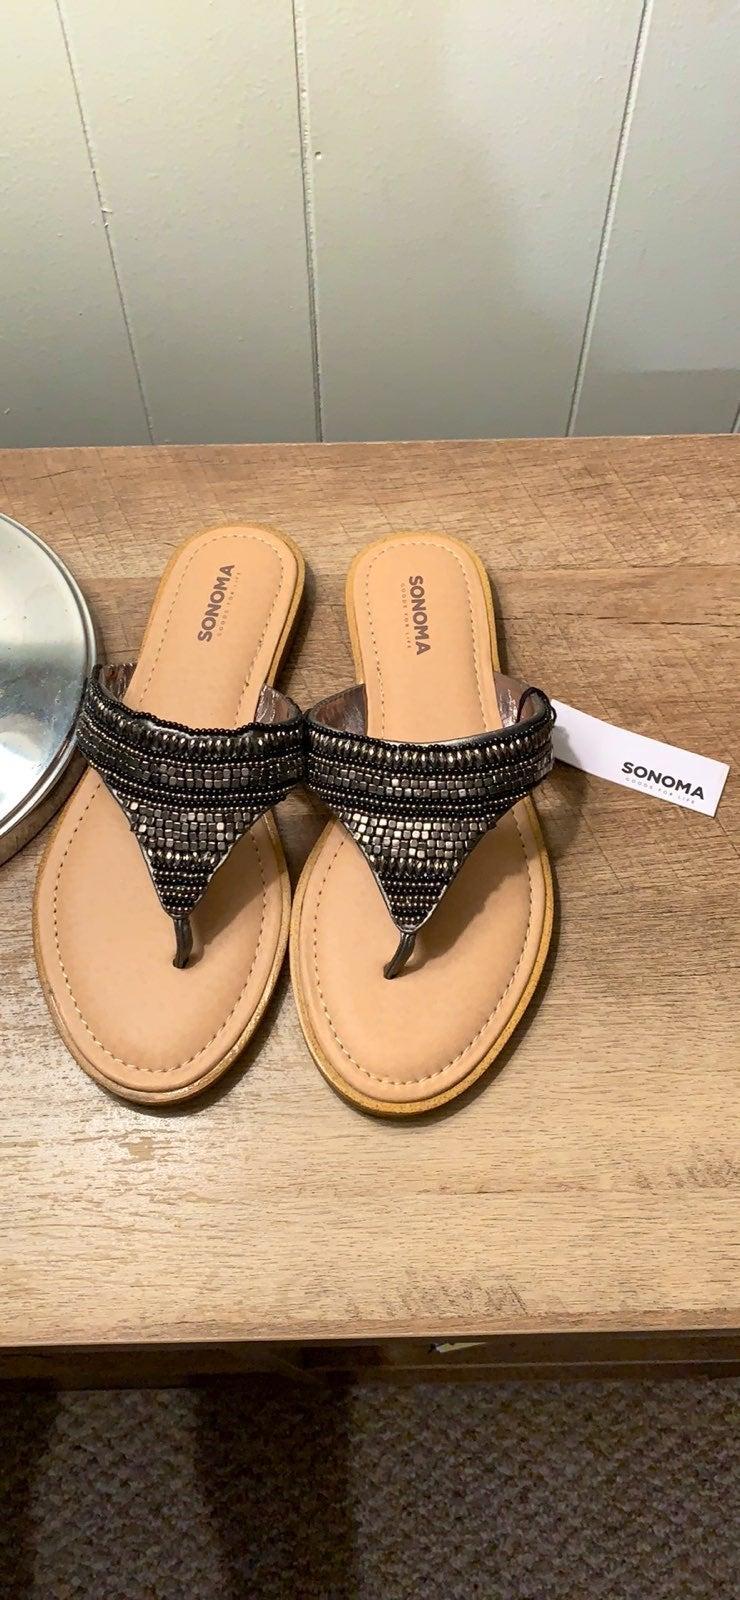 SONOMA beaded sandals